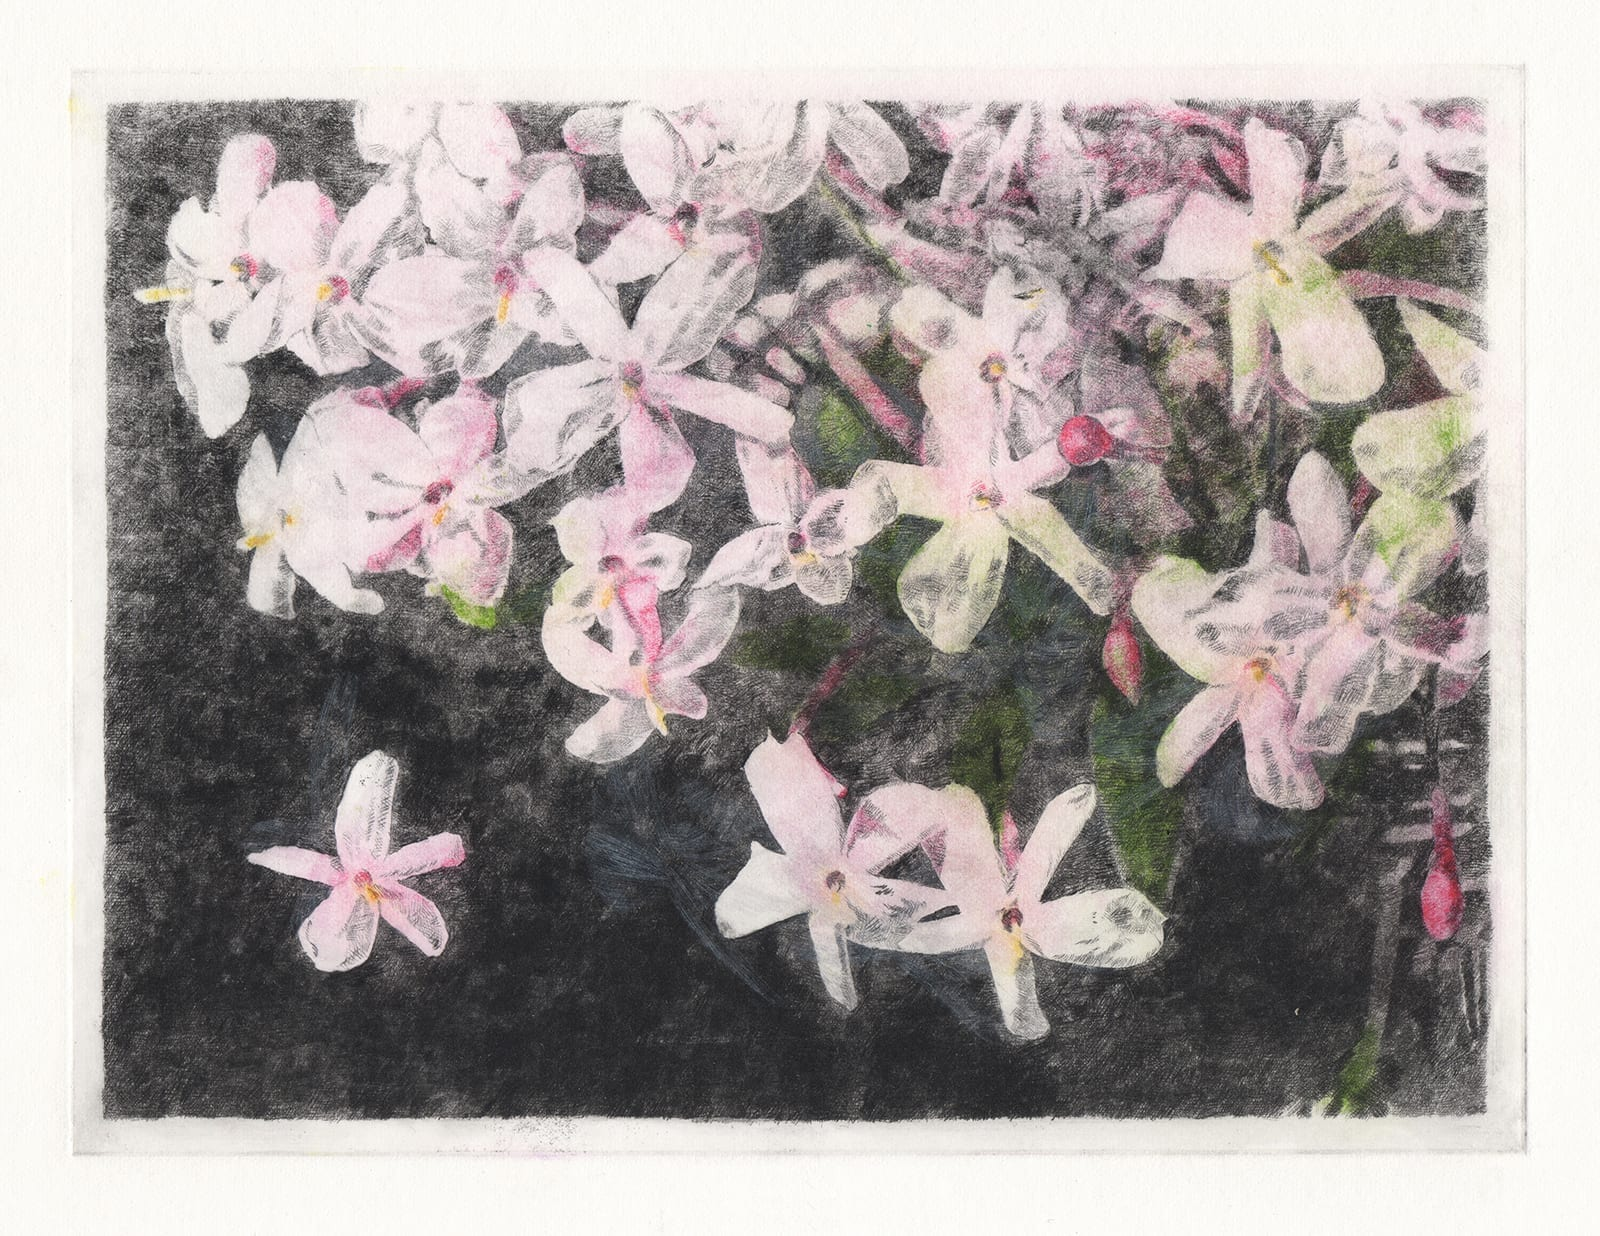 Dancing flowers: Jasmine (drypoint etching by Yaemi Shigyo)